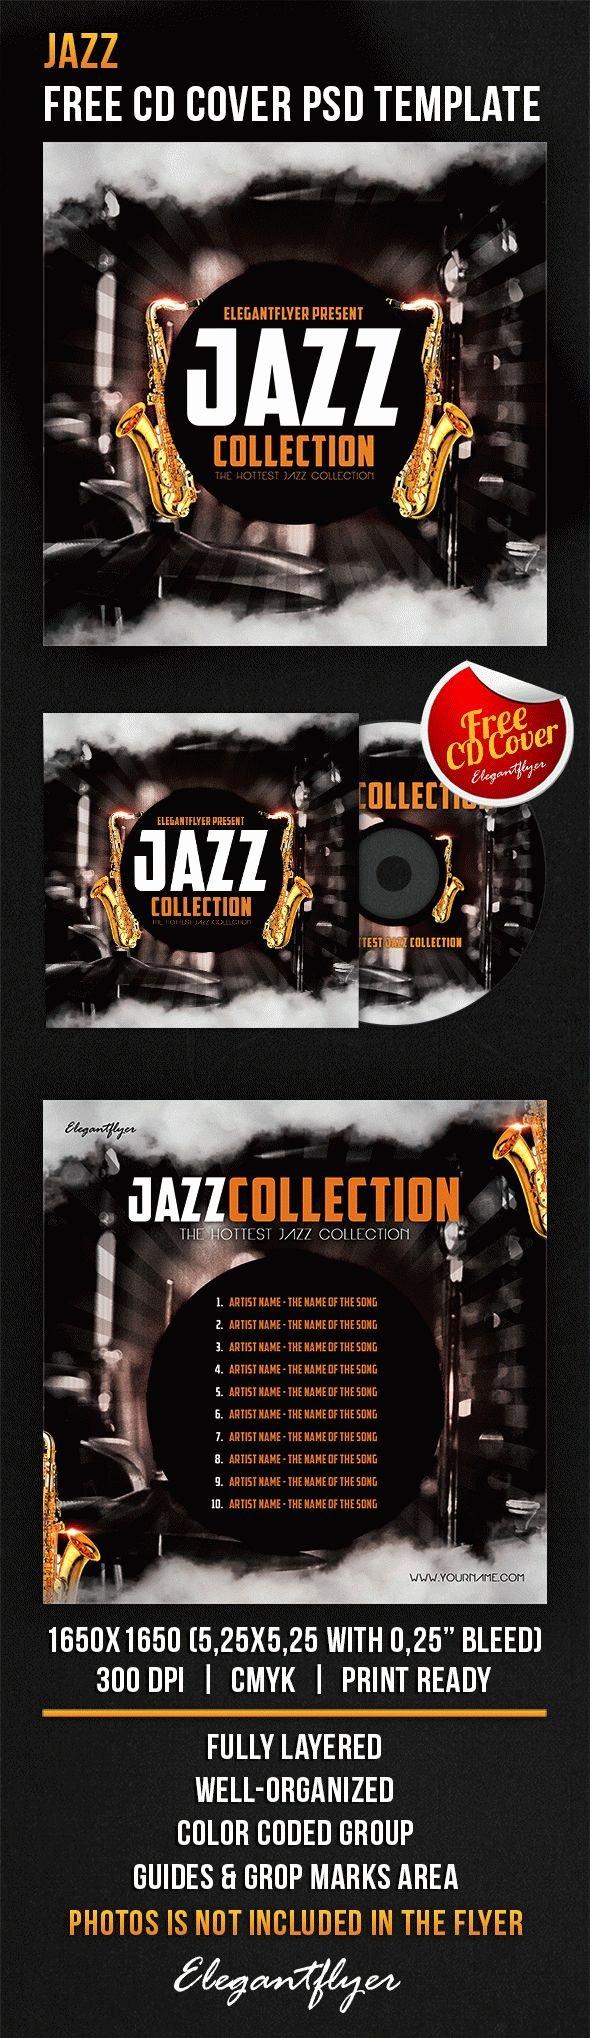 Jazz – Free Cd Cover Psd Template – by Elegantflyer